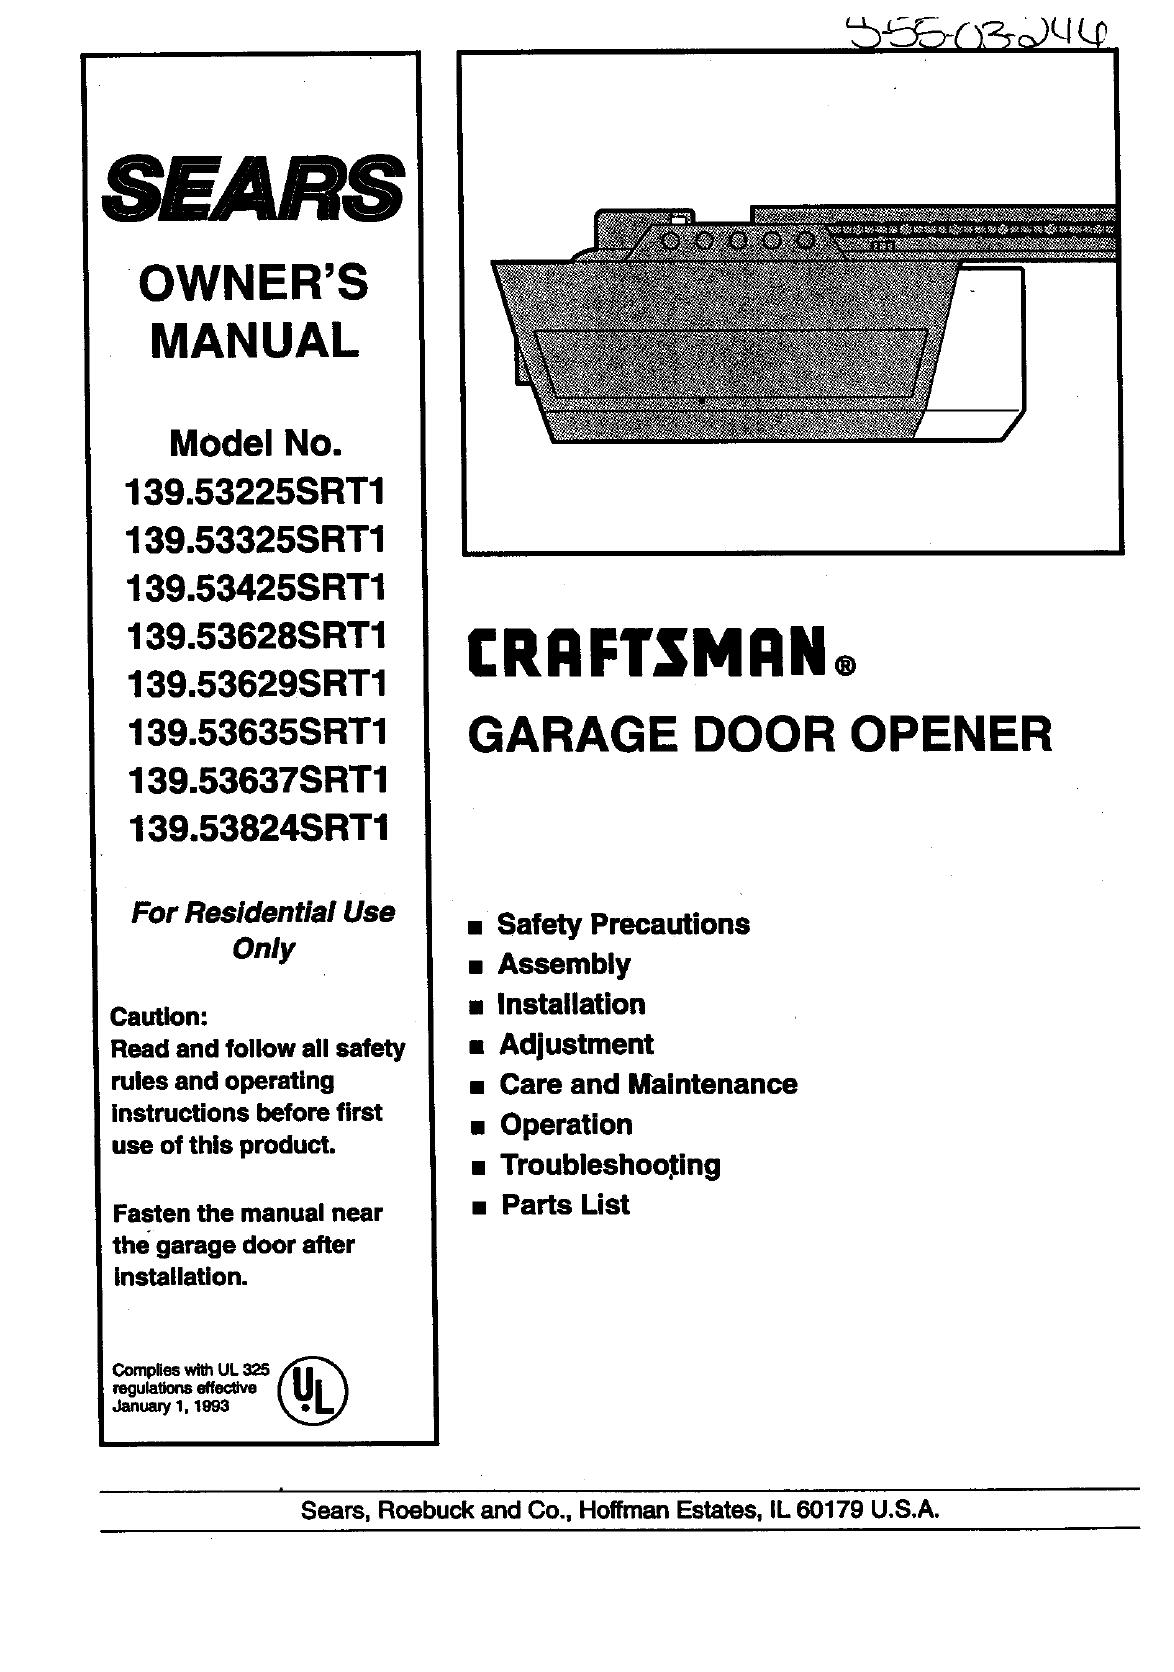 Craftsman 13953225srt1 User Manual Garage Door Opener Manuals And Schematic Installation Guides L9050379